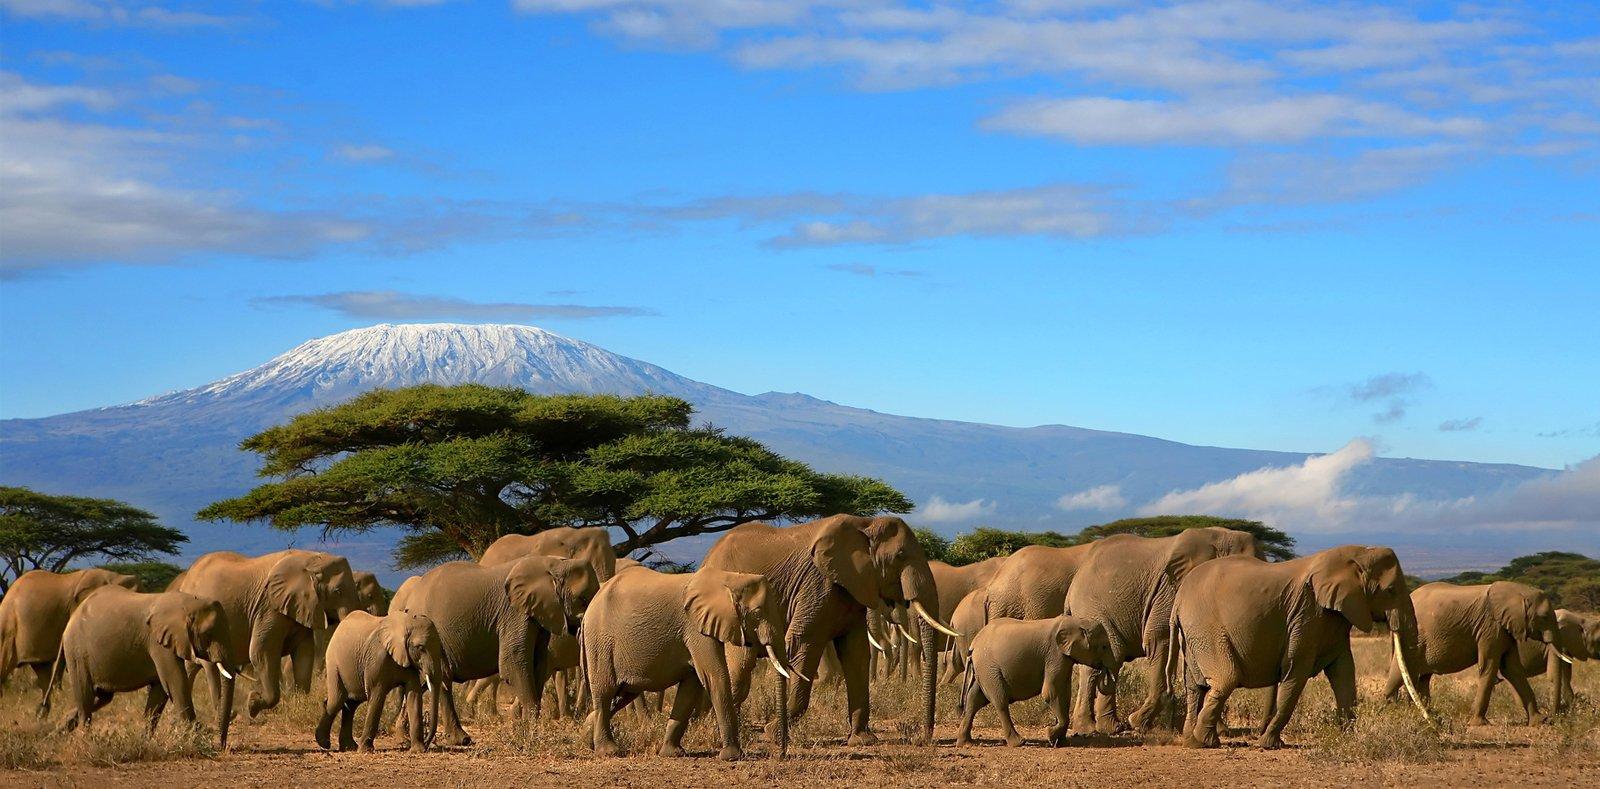 Kilimanjaro With Elephants Infront